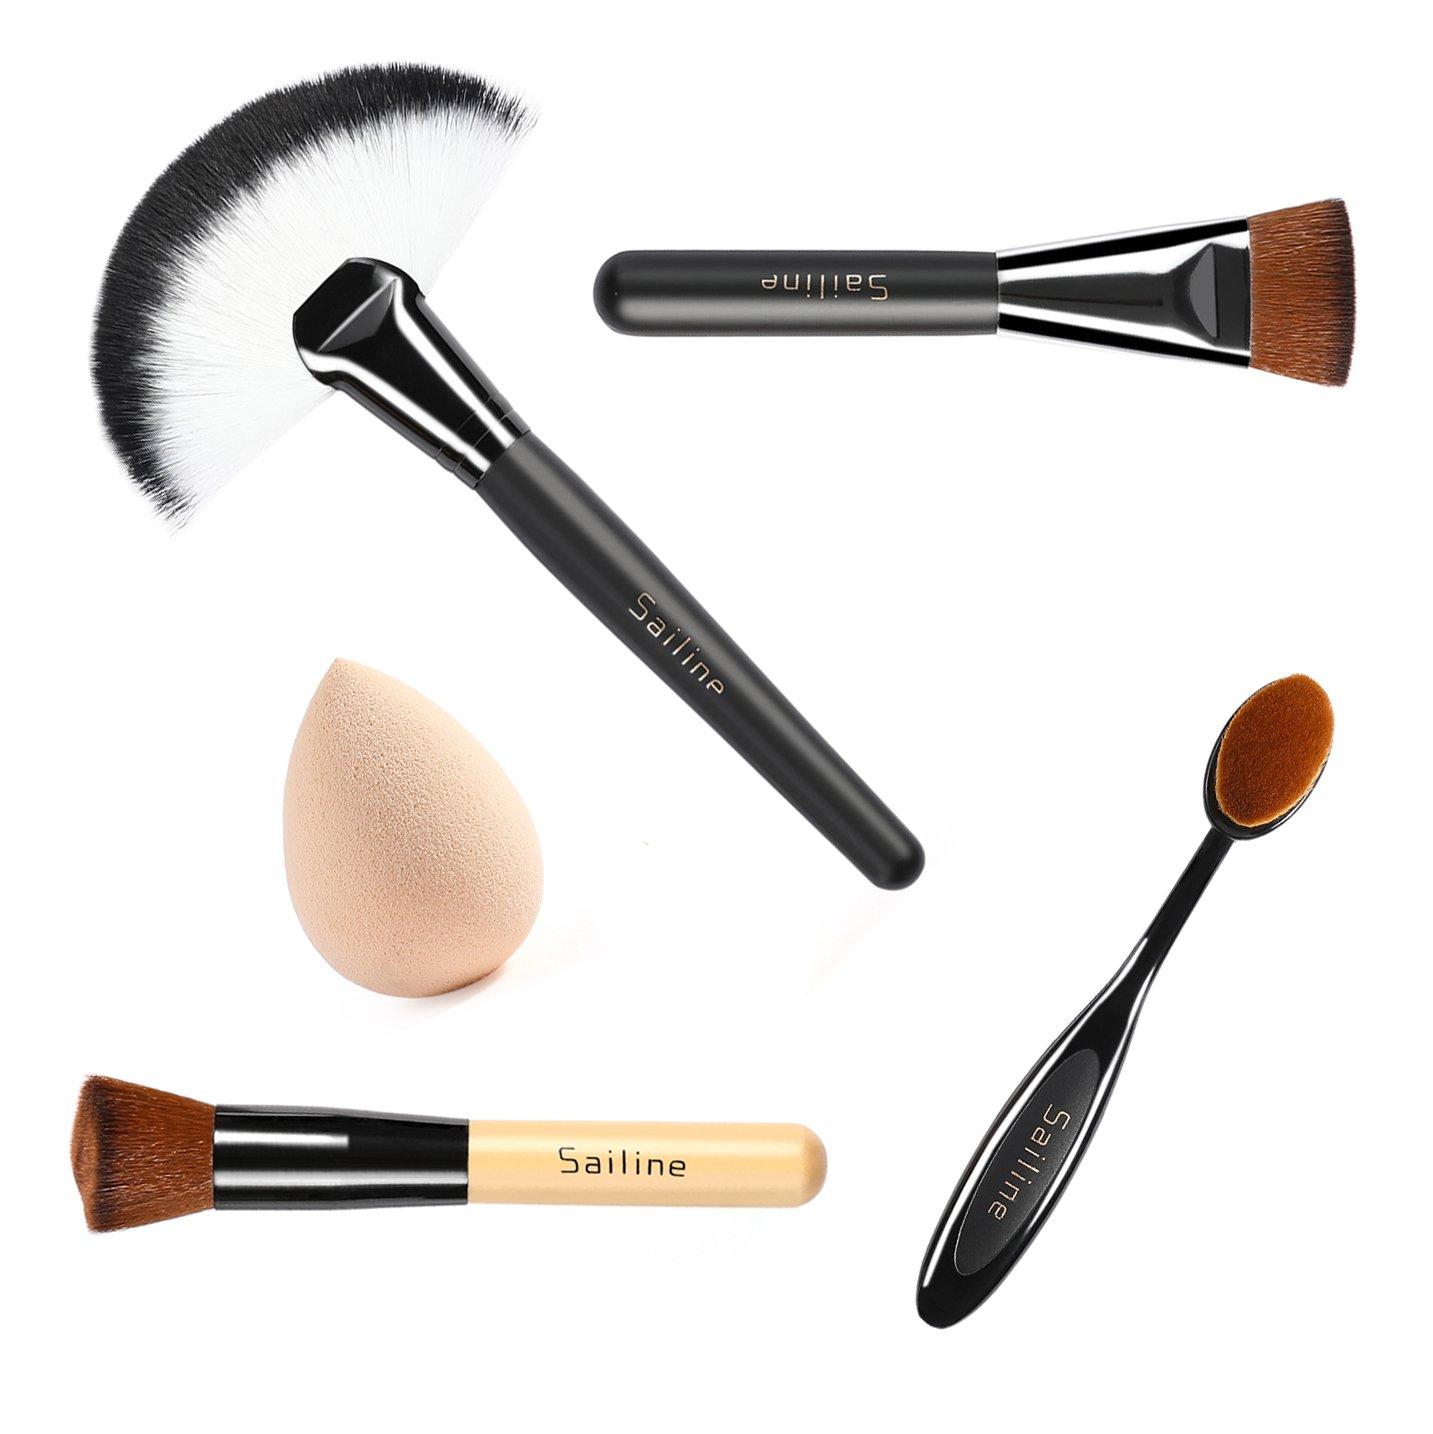 SAILINE 2018 NEW Foundation Cream Contour Powder Concealer Foundation Cosmetics Tool Makeup Brushes Toothbrush Mixing Sets (black)